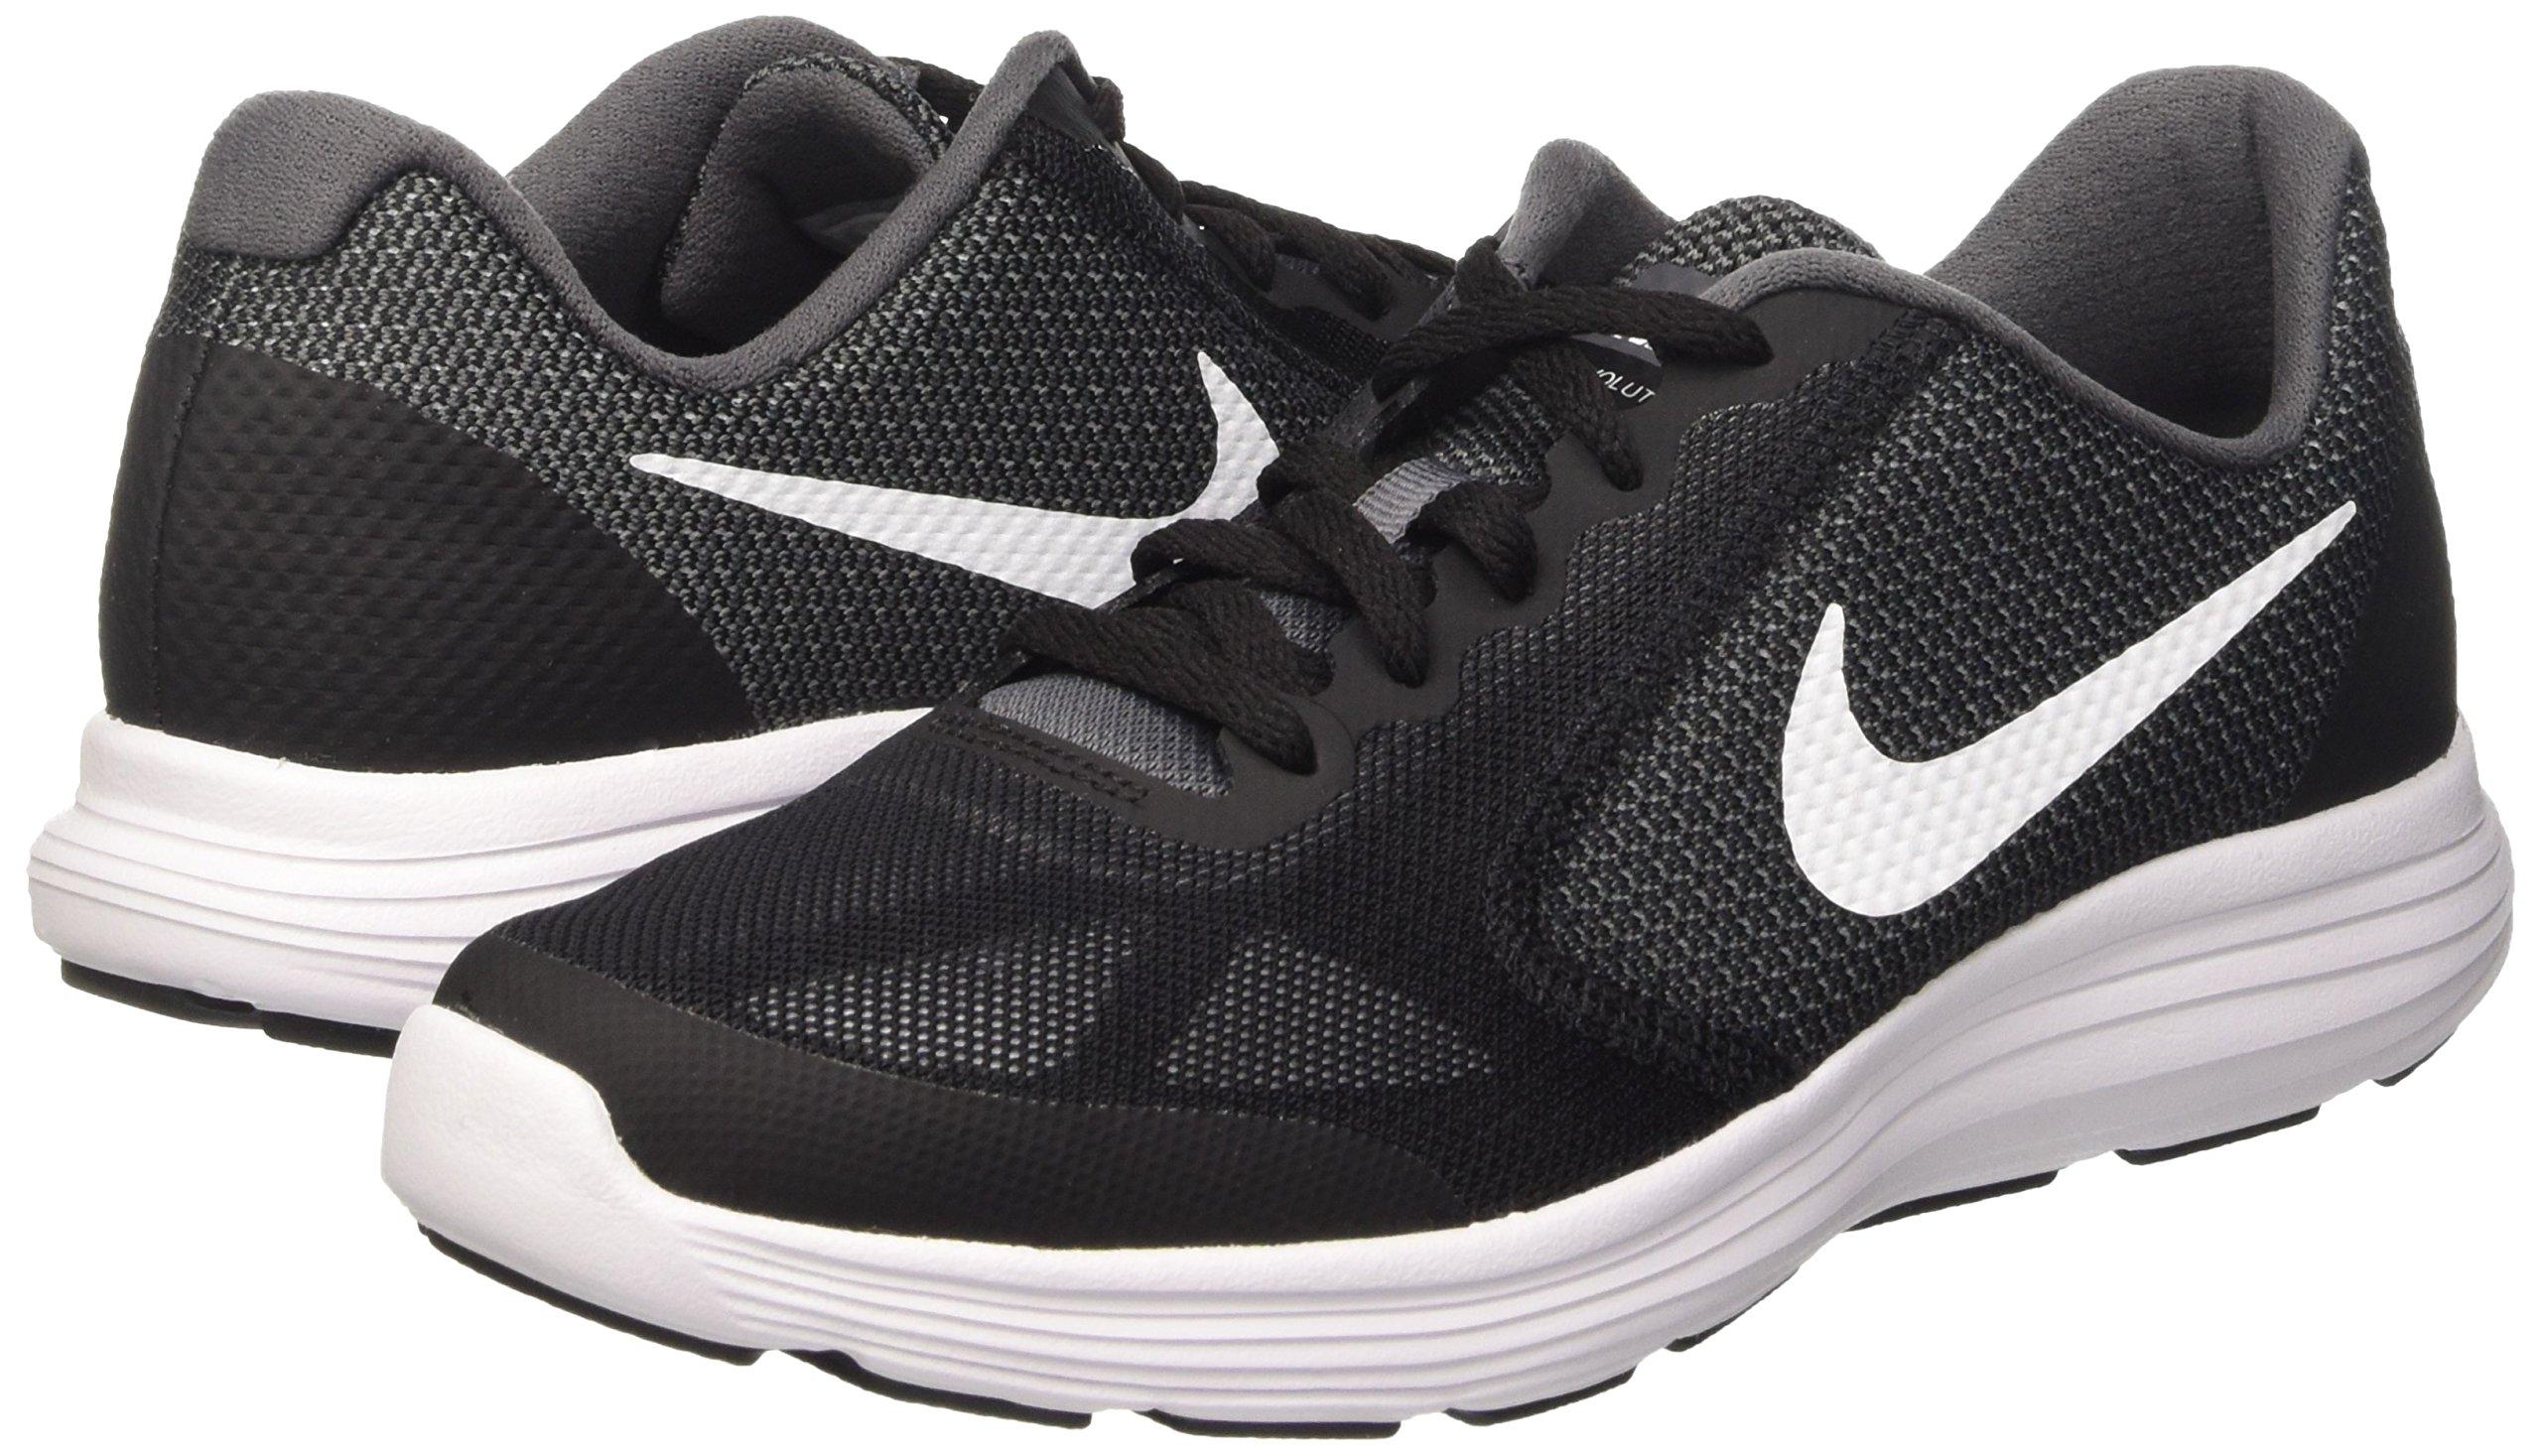 Nike Boys' Revolution 3 (GS) Running Shoe Dark Grey/White/Black/Pure Platinum 3.5 M US Big Kid by Nike (Image #5)